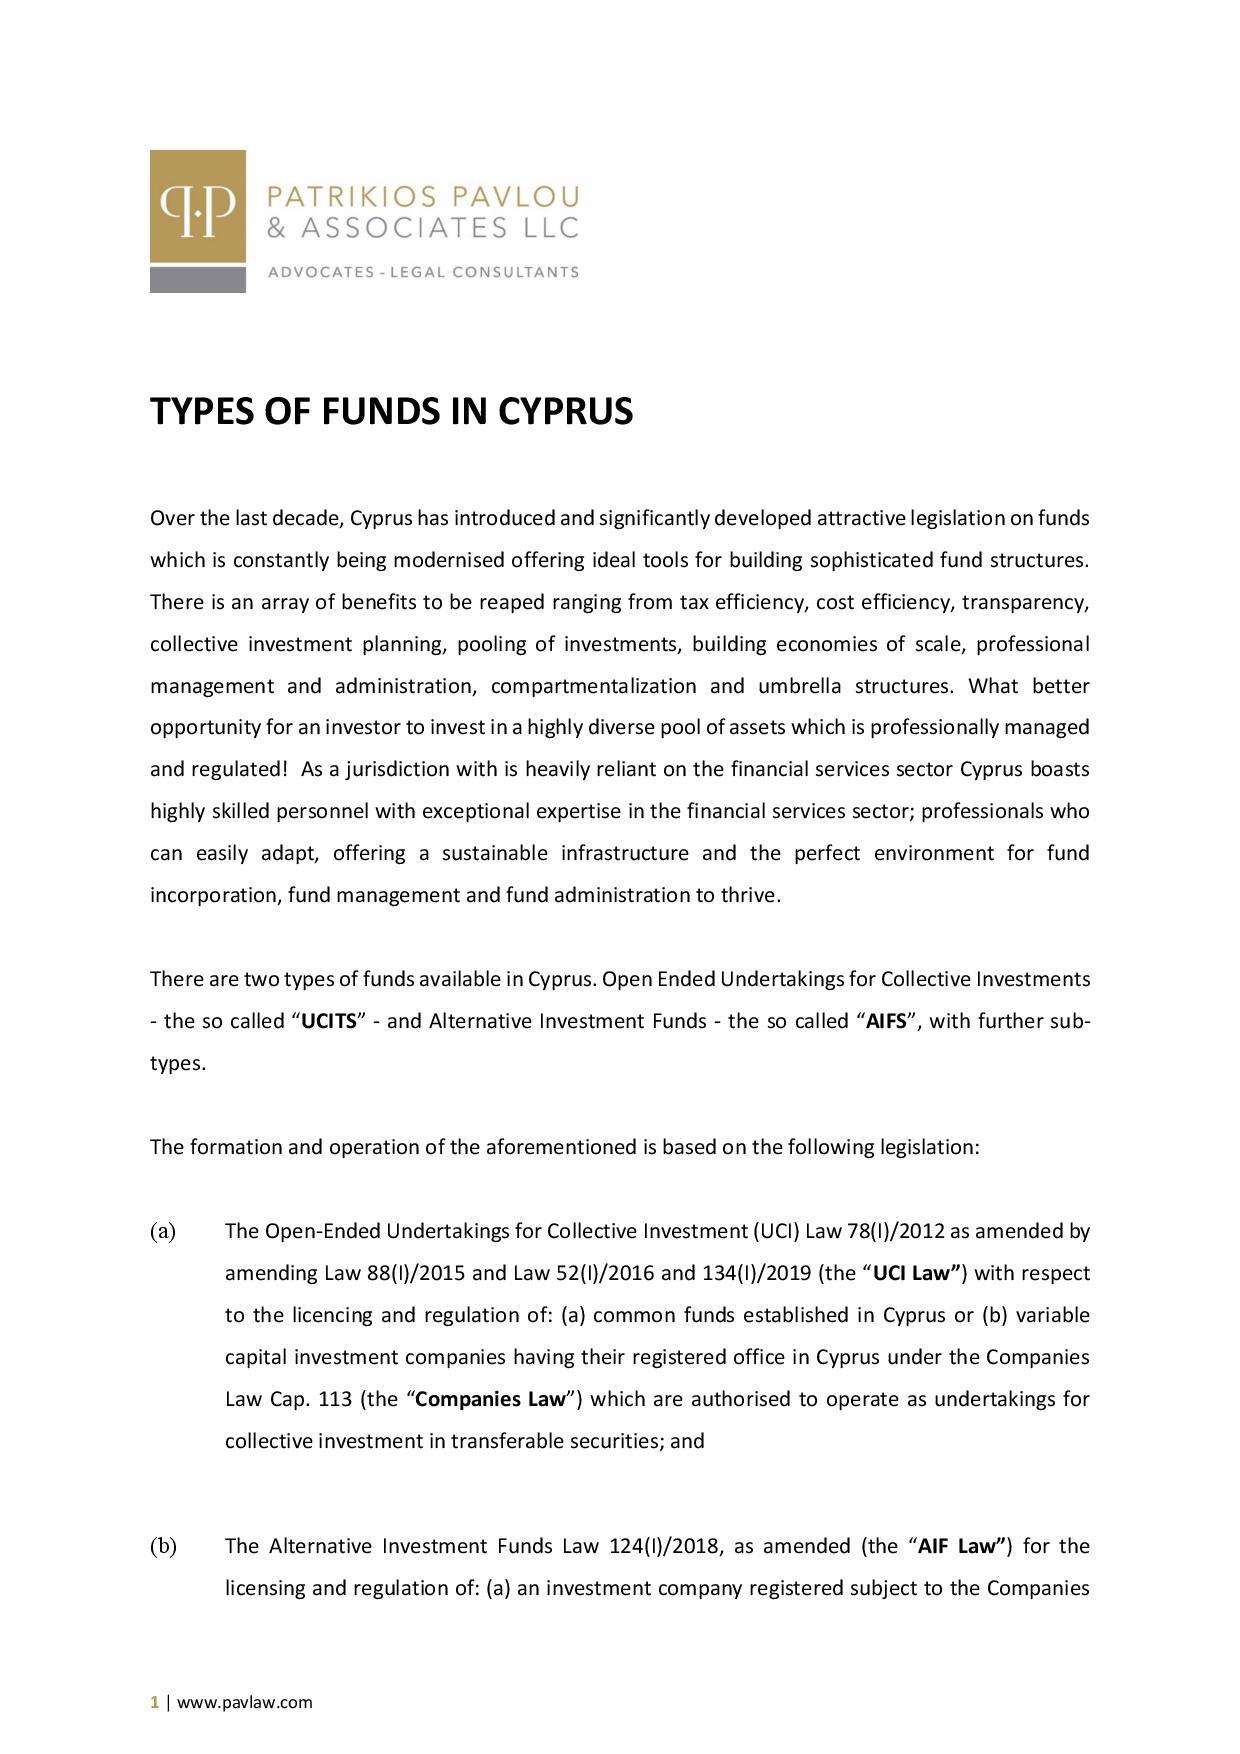 Patrikios Pavlou & Associates LLC: Types of Cyprus Funds